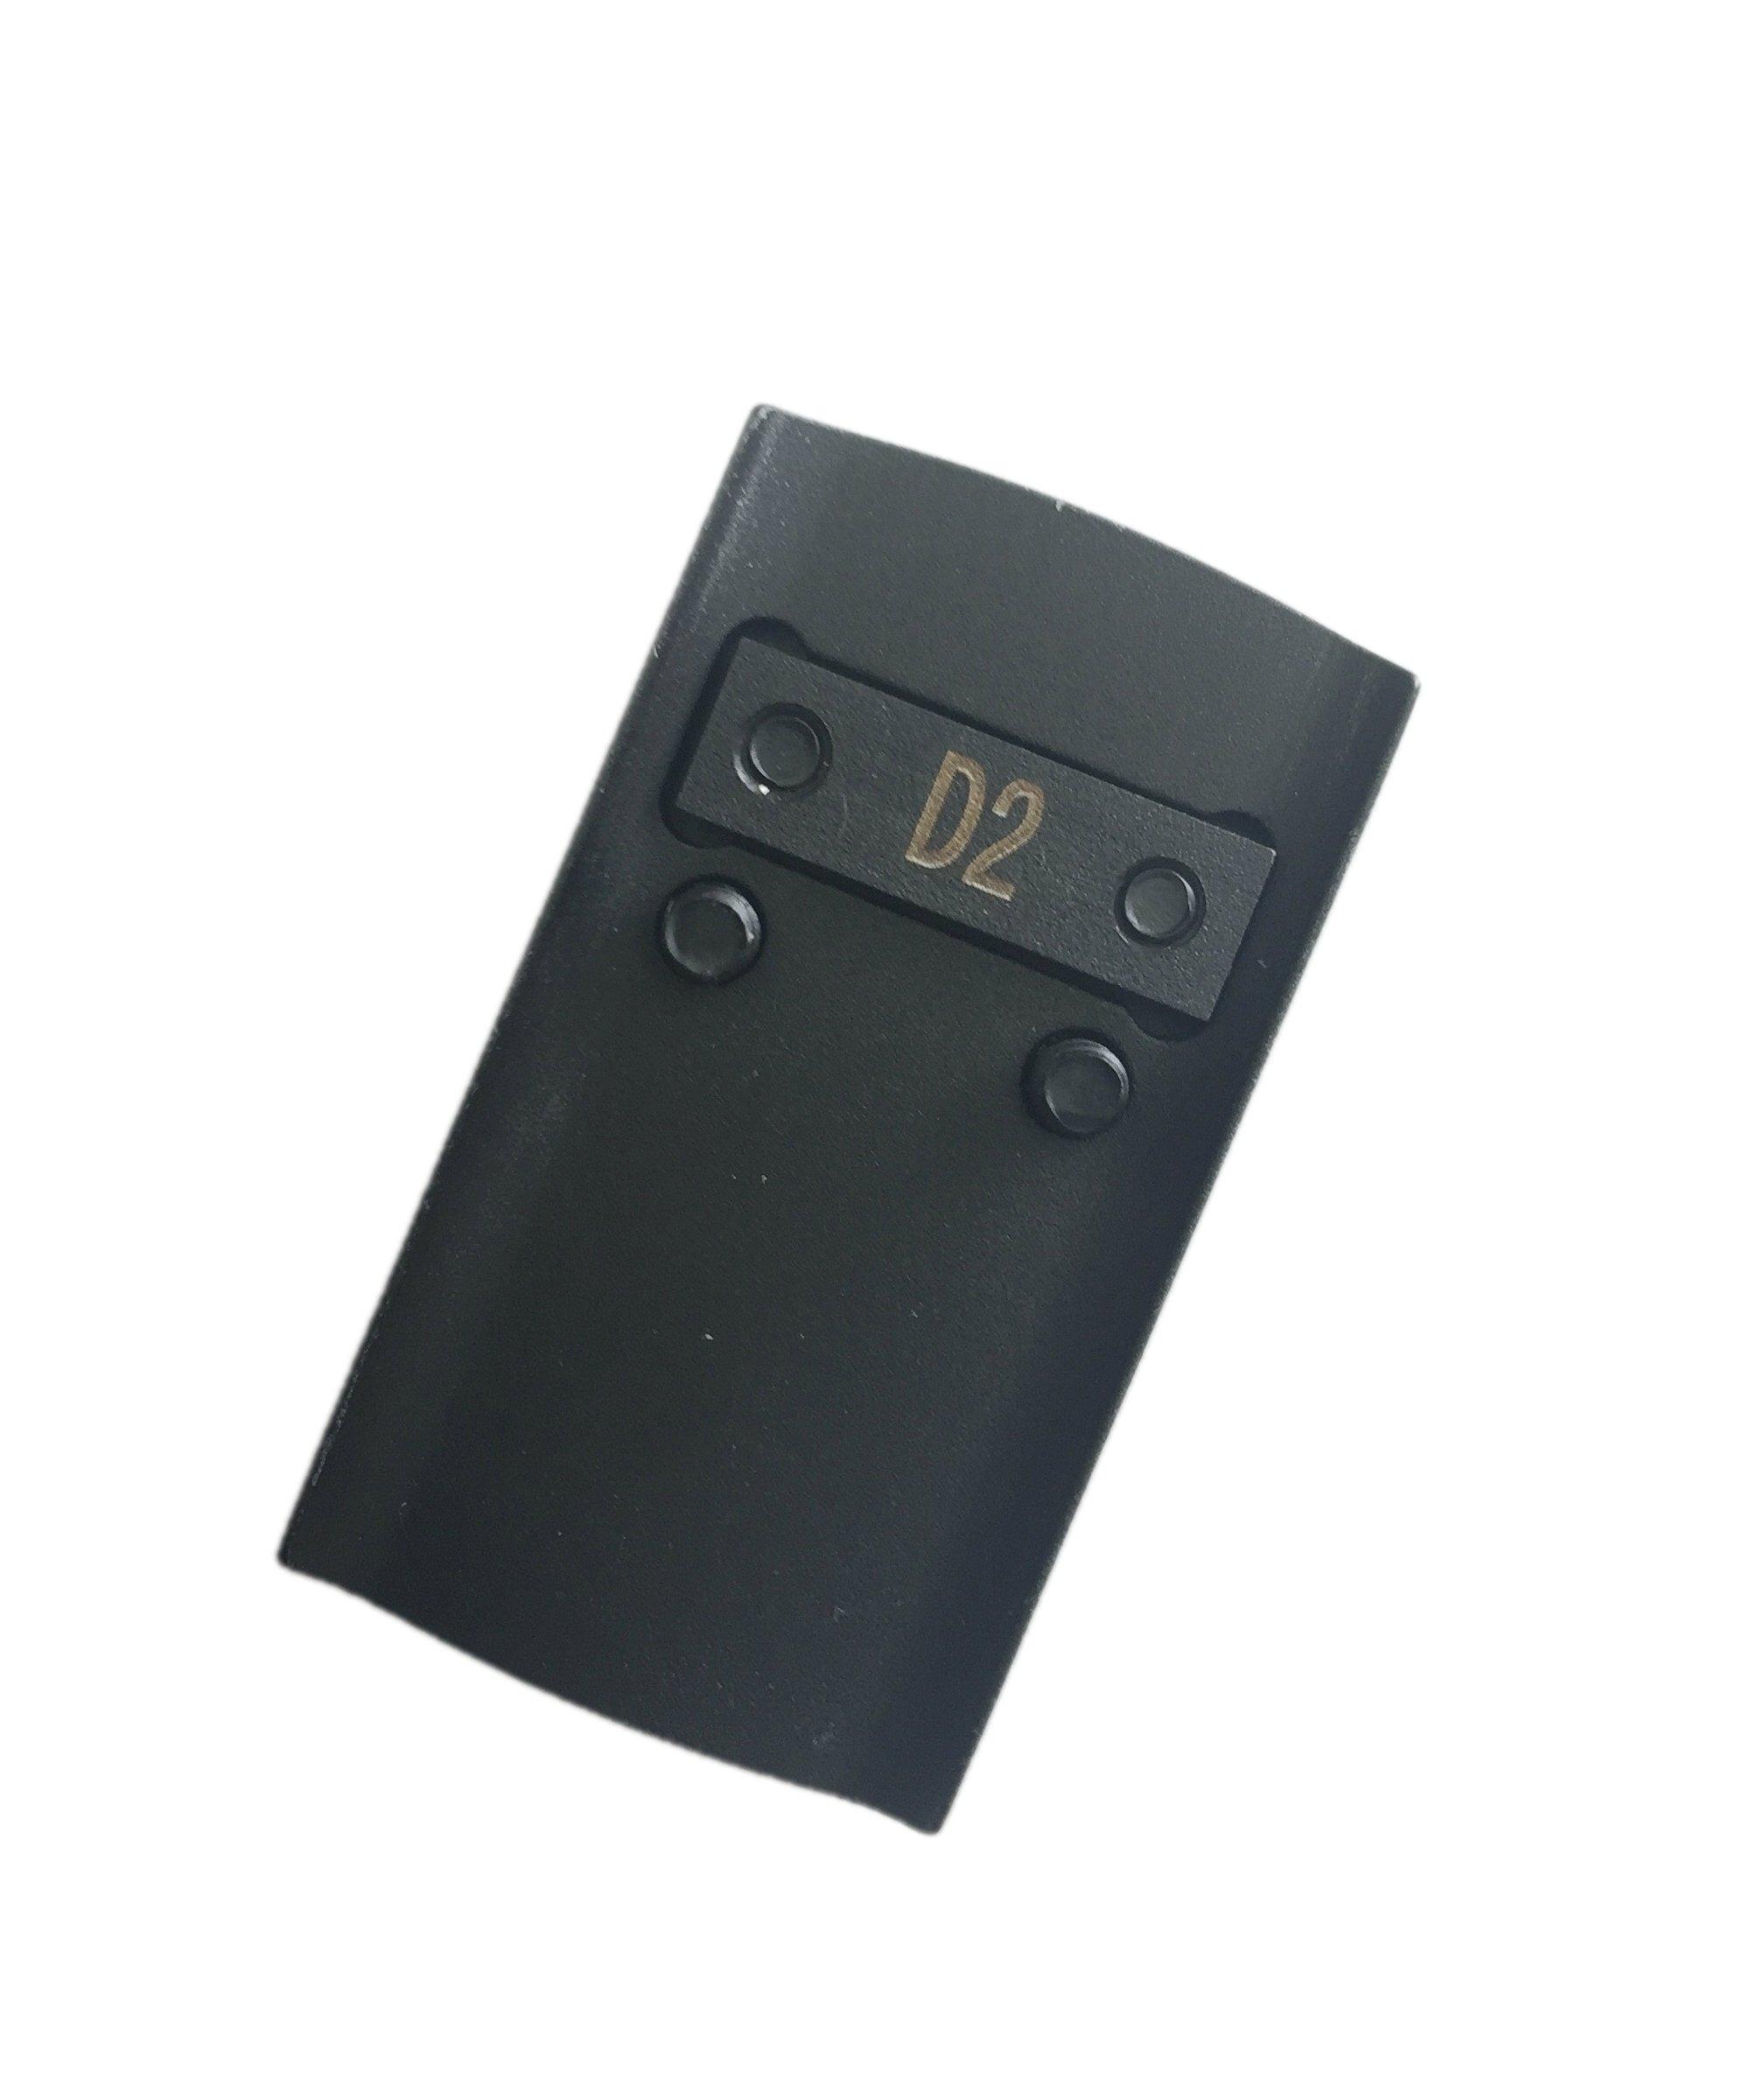 Ade Advanced Optics glock-1 Mini/Micro Reflex Dot Sight Mounting Plate for Glock